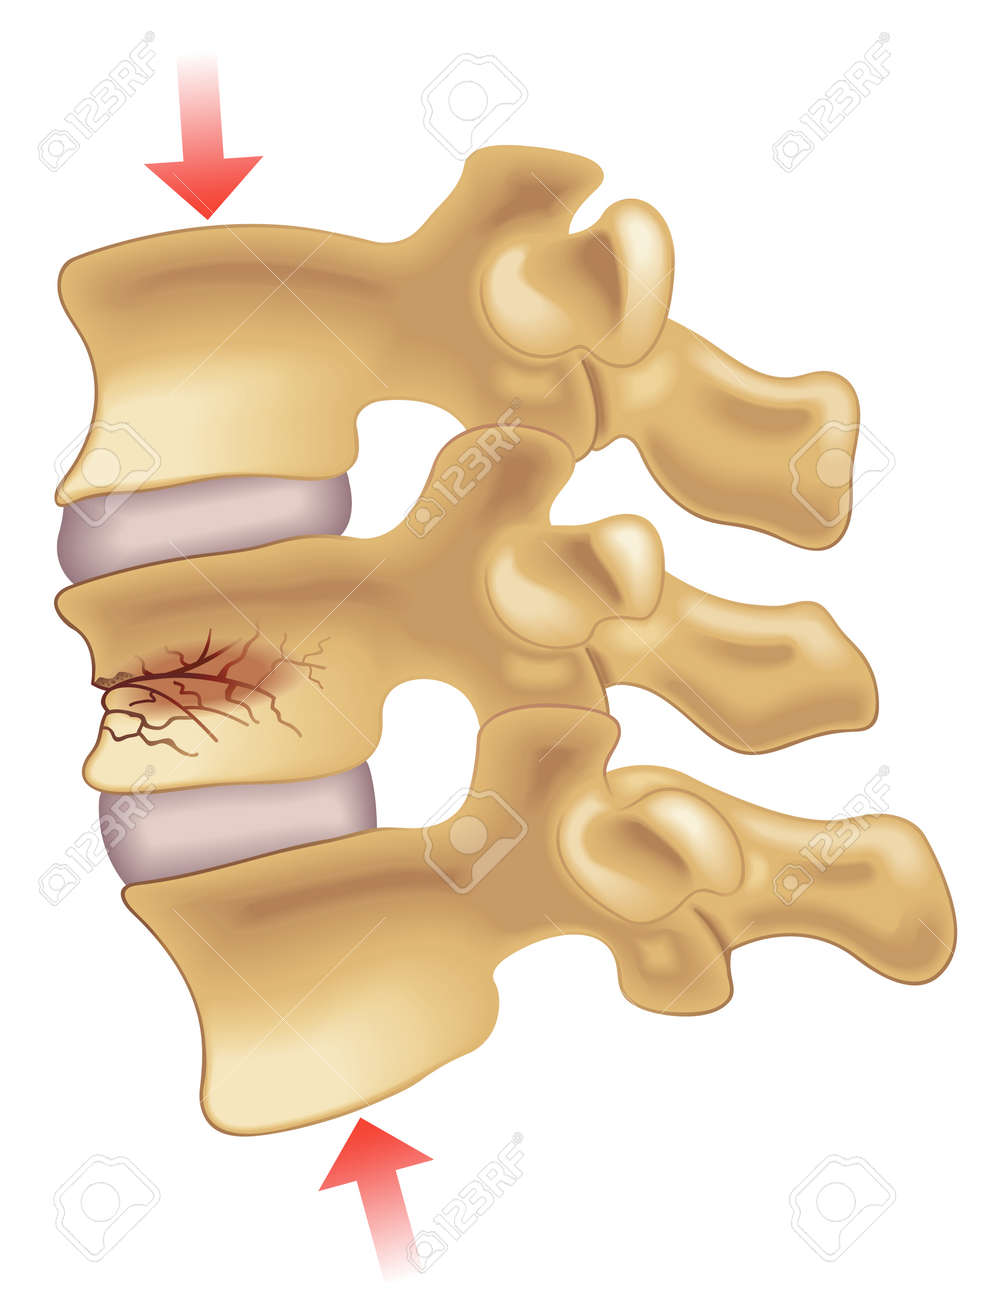 vertebral compression fracture - 57153846